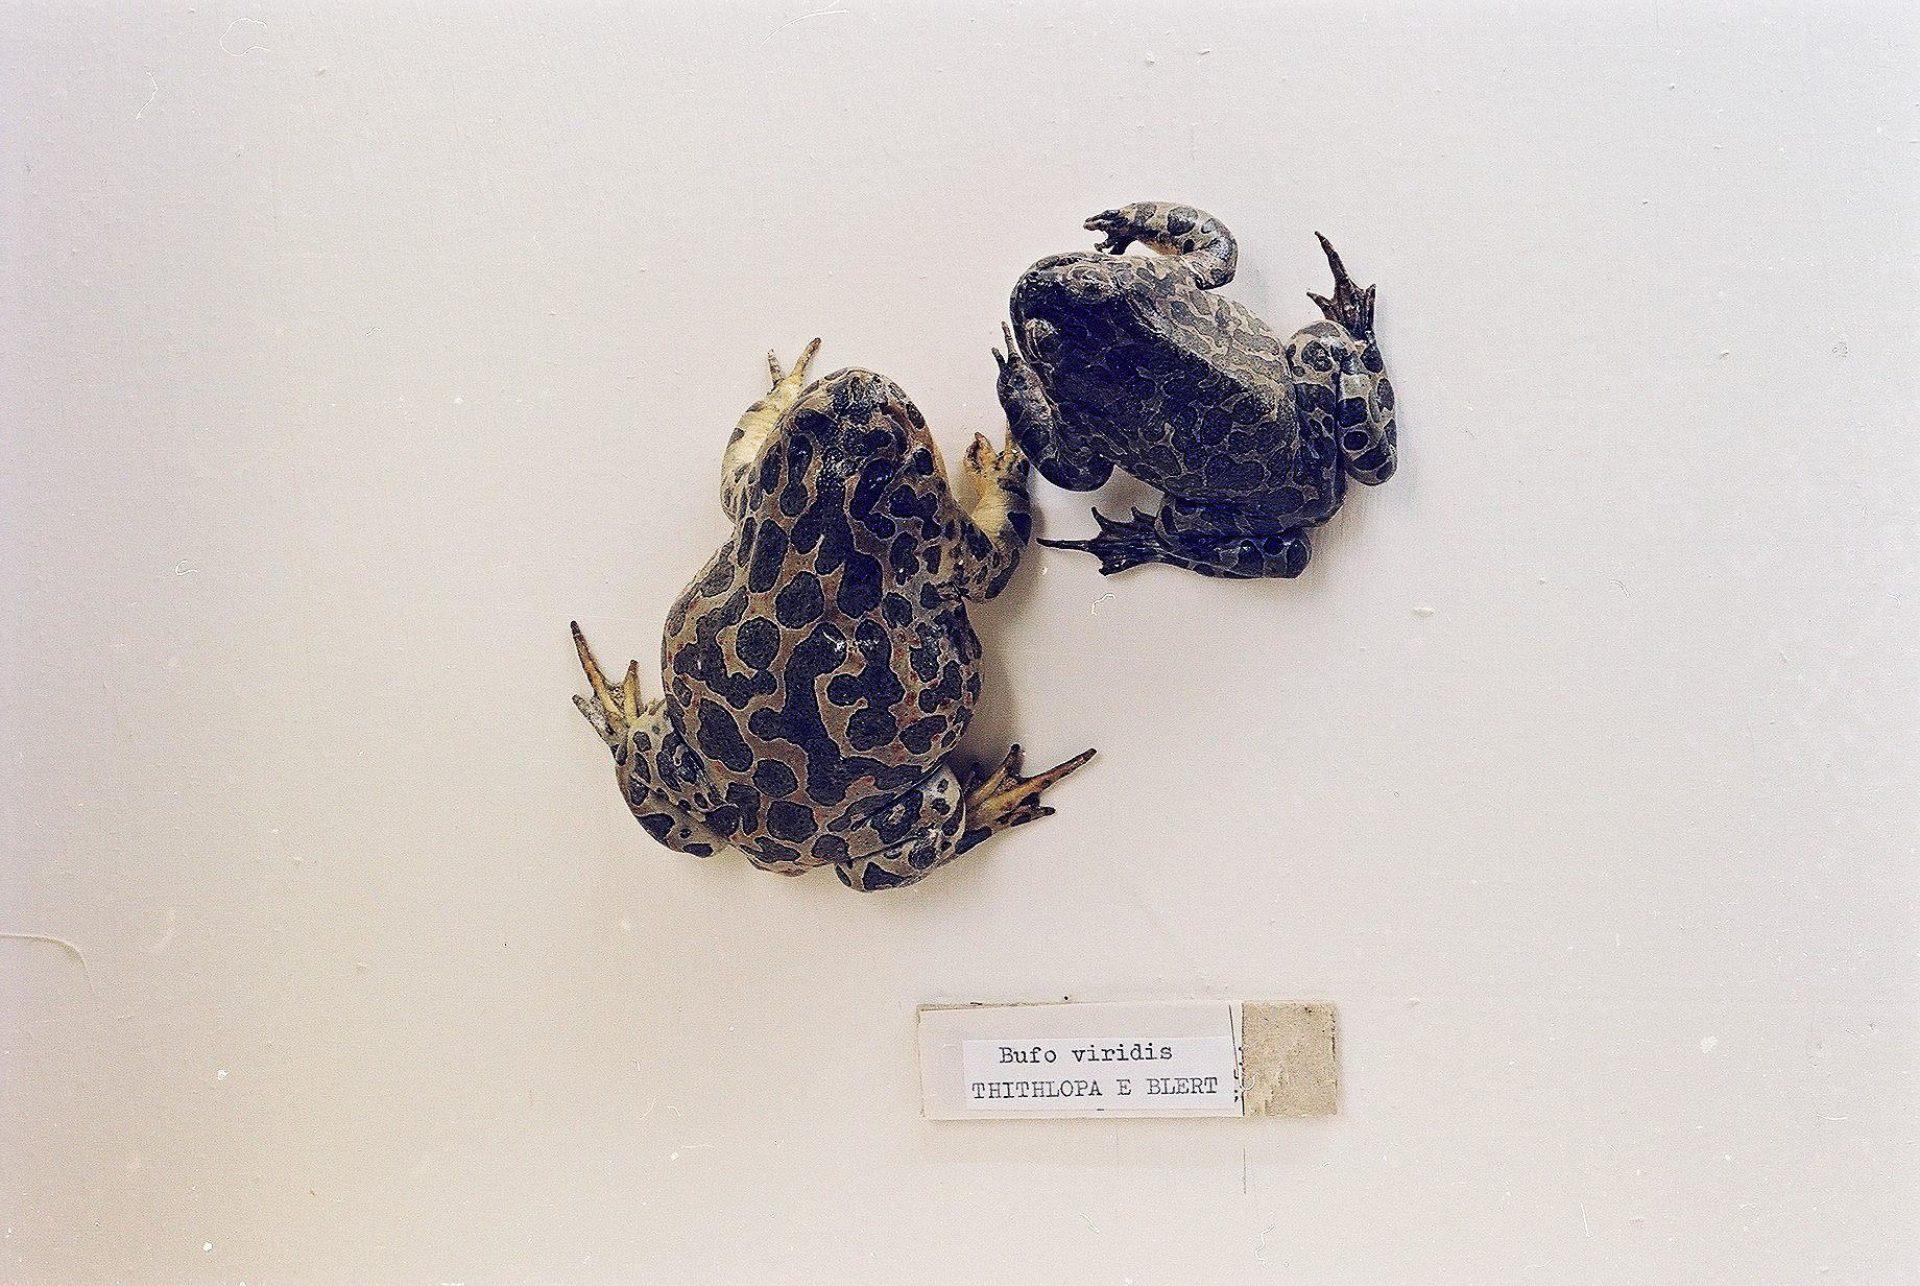 Petrit Halilaj, Special Edition (ex-Natural History Museum of Kosovo), 2013 (04/80)